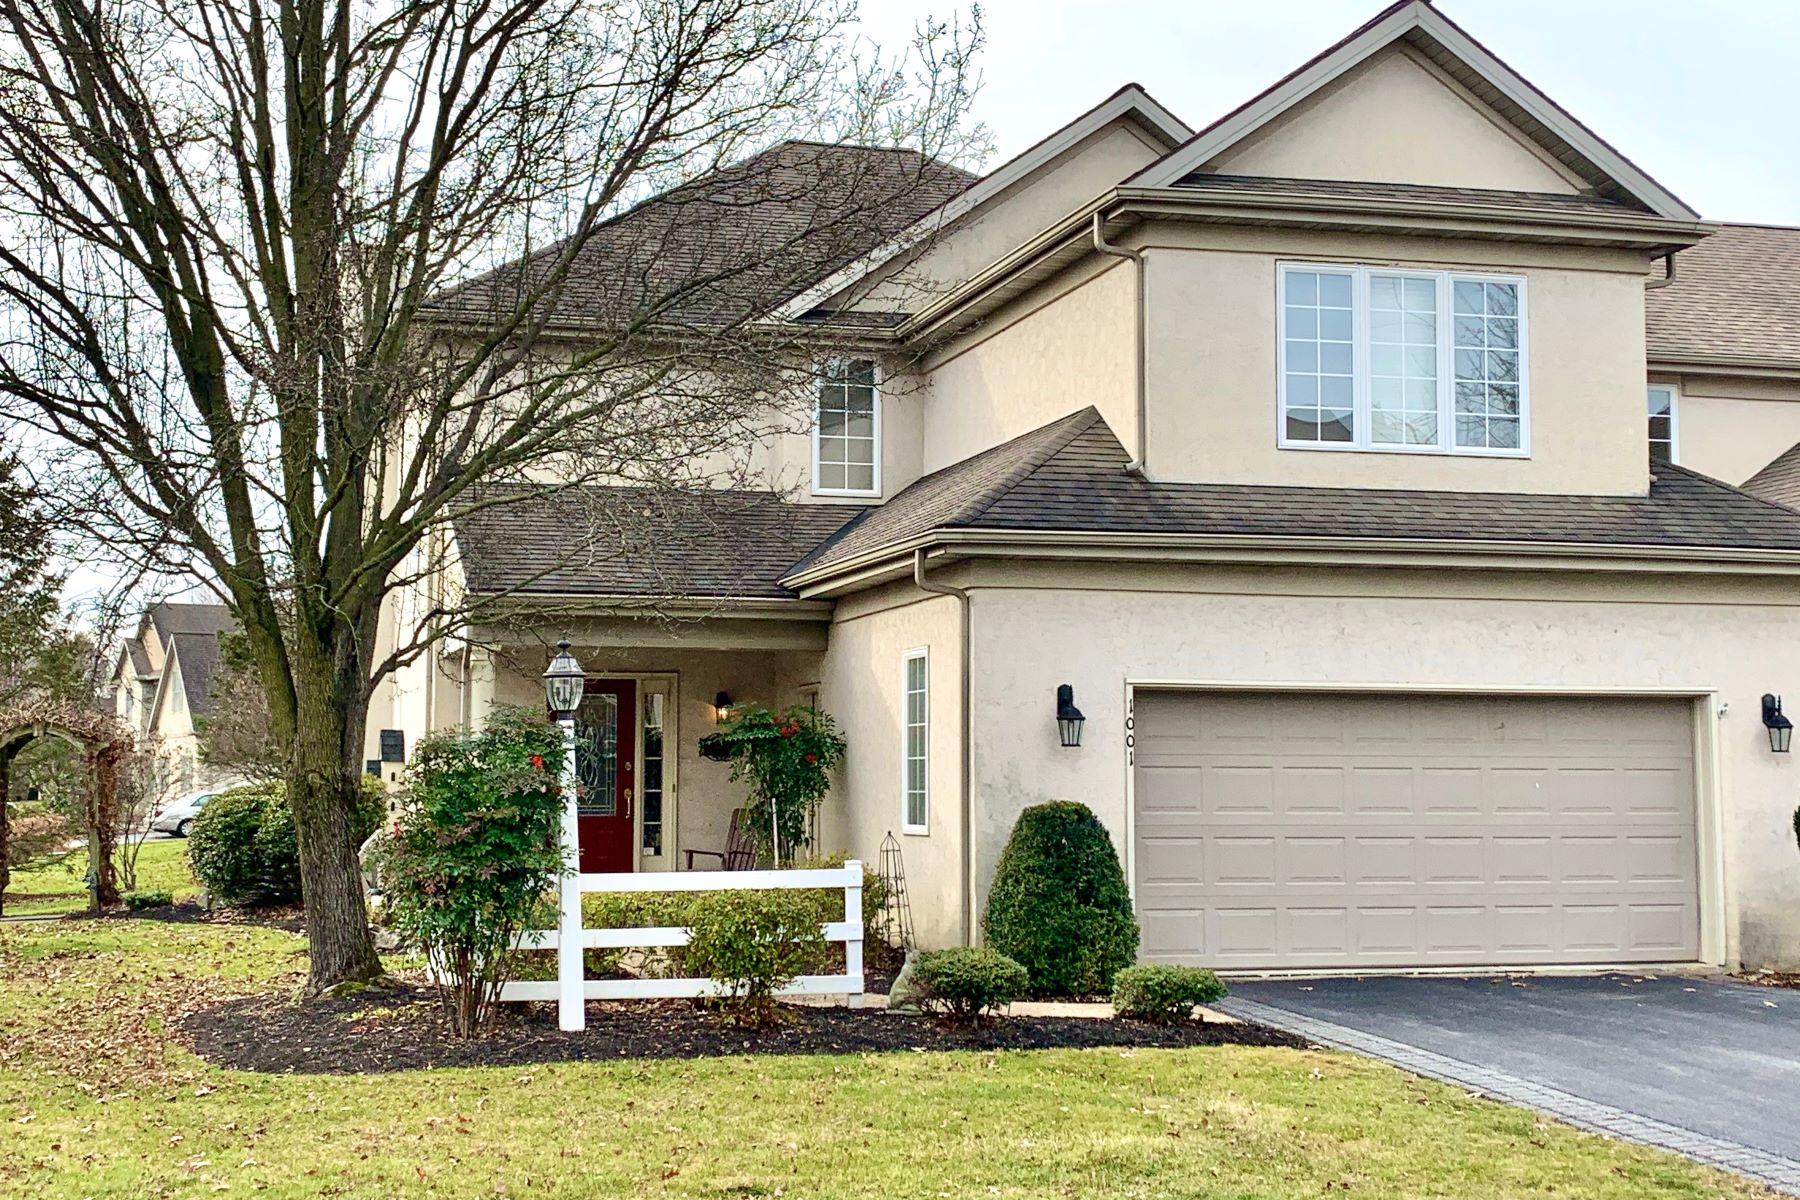 Single Family Homes for Sale at 1001 STILLWOOD CIRCLE Lititz, Pennsylvania 17543 United States